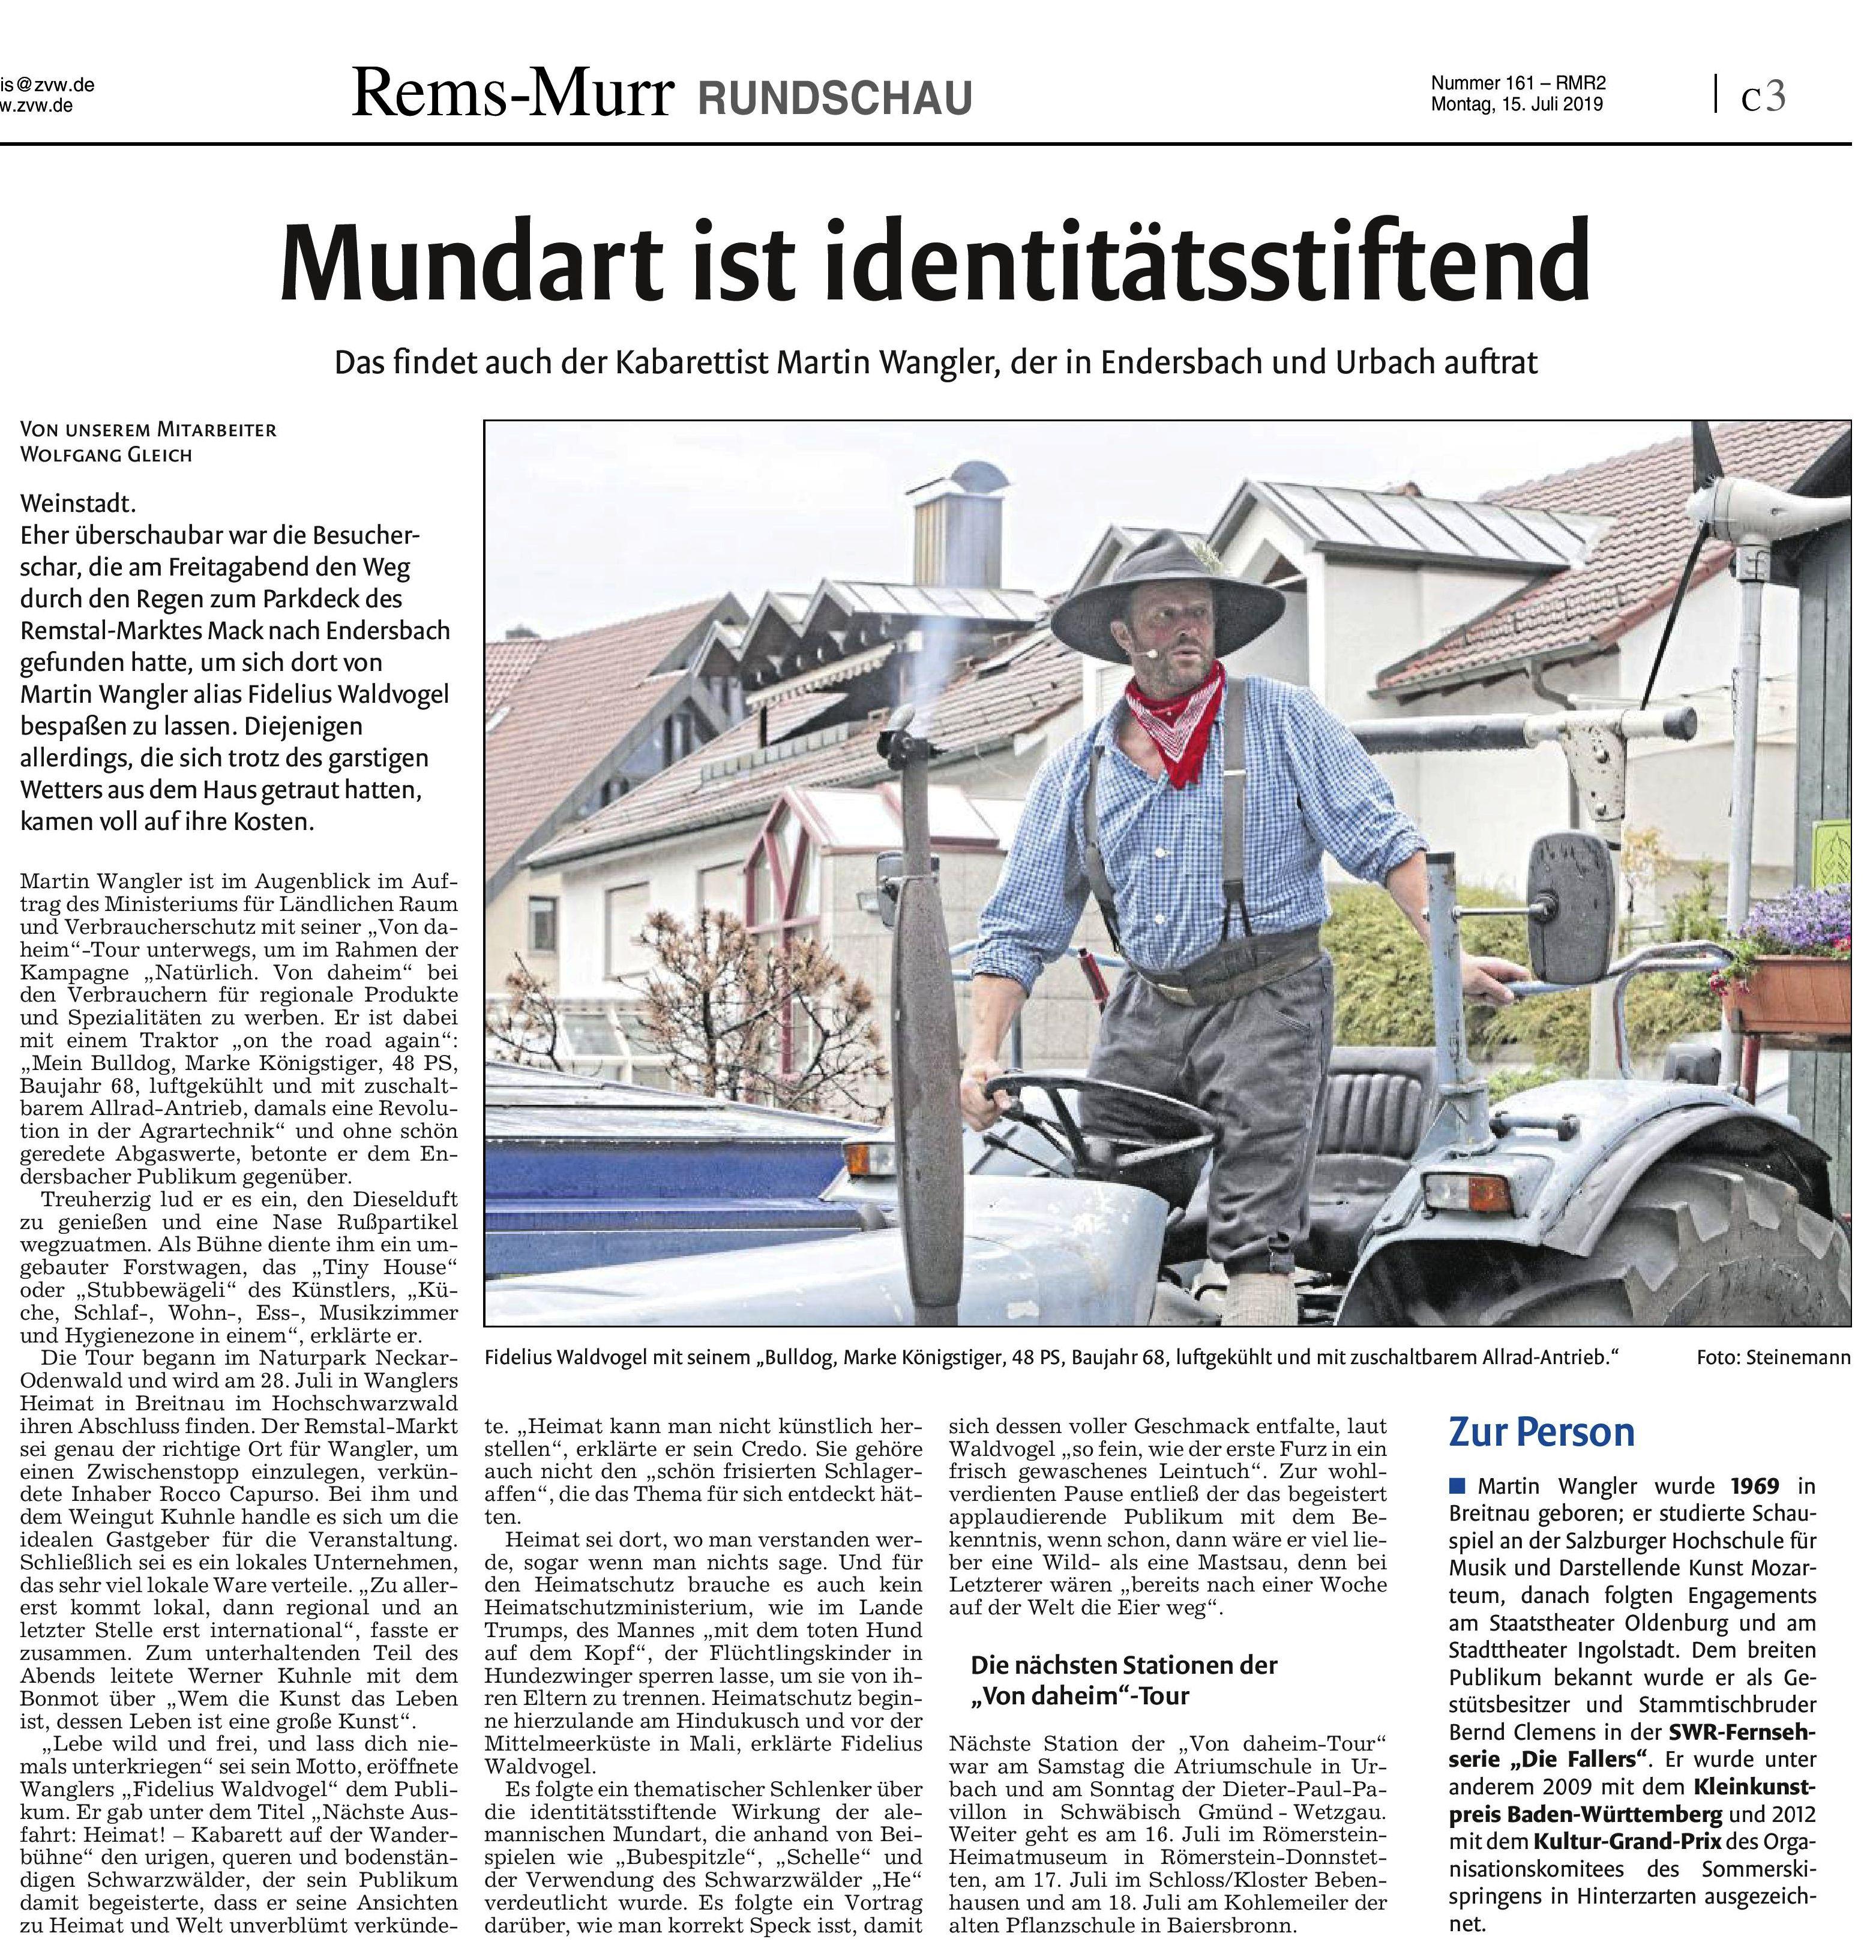 <?=Mundart ist identitätsstiftend?>